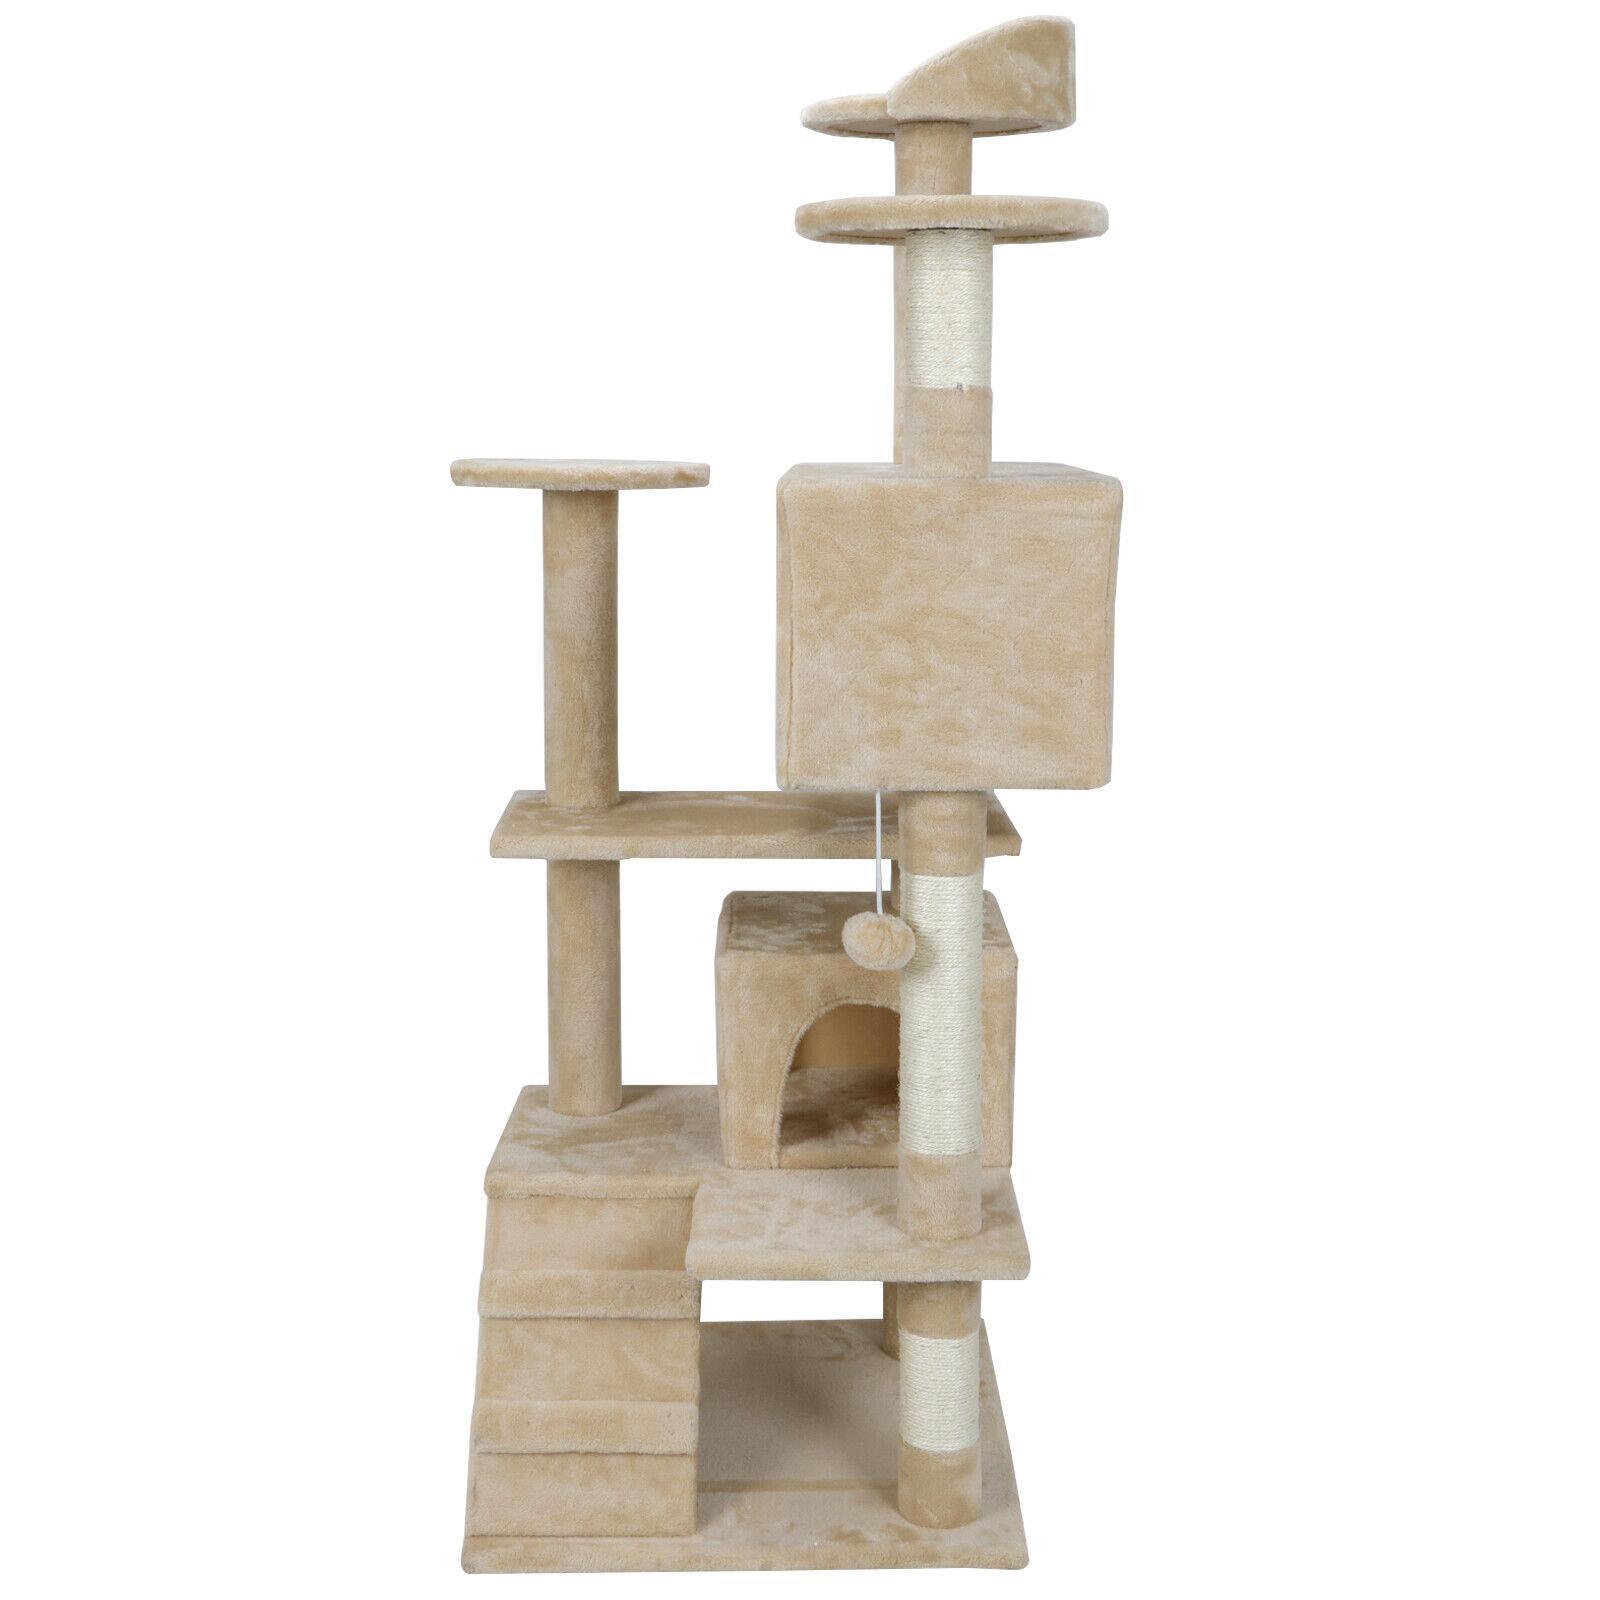 Kitten Cat Tree 53″ House Play Tower Scratcher Beige Condo Post Bed Furniture Cat Supplies